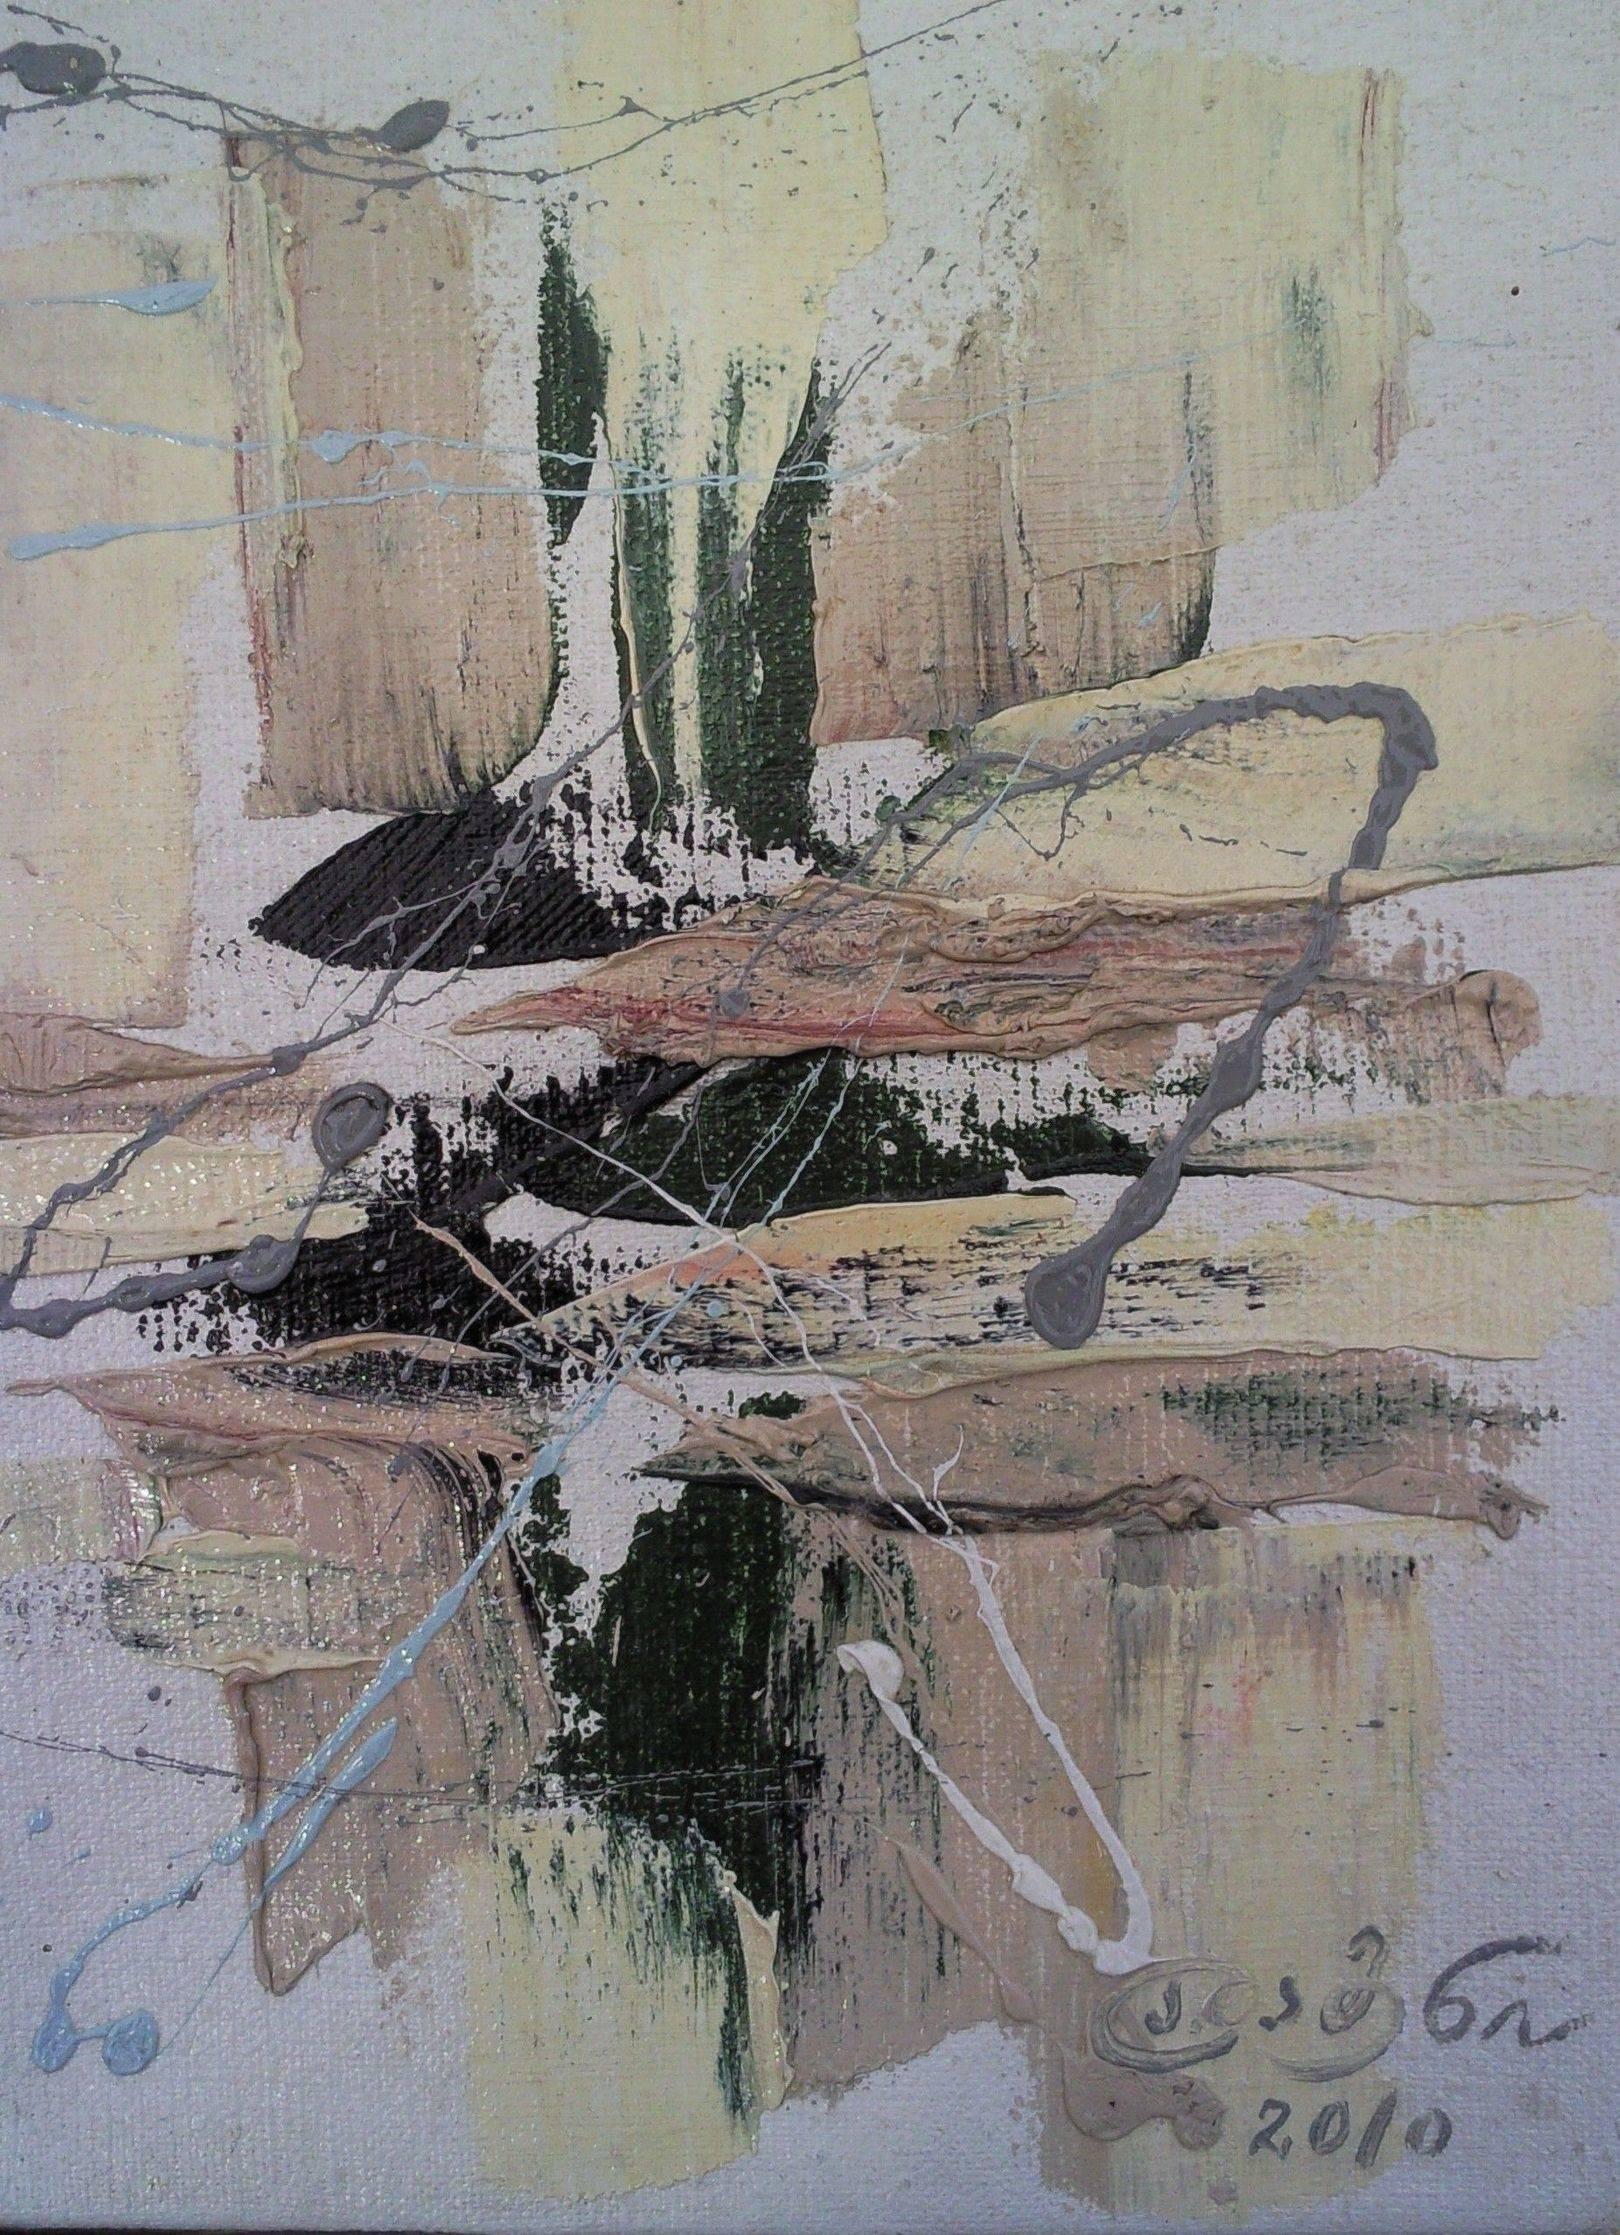 «Джаз вариация»     холст, масло «Jazz variation»         oil on canvas                                                                               30x24, 2010